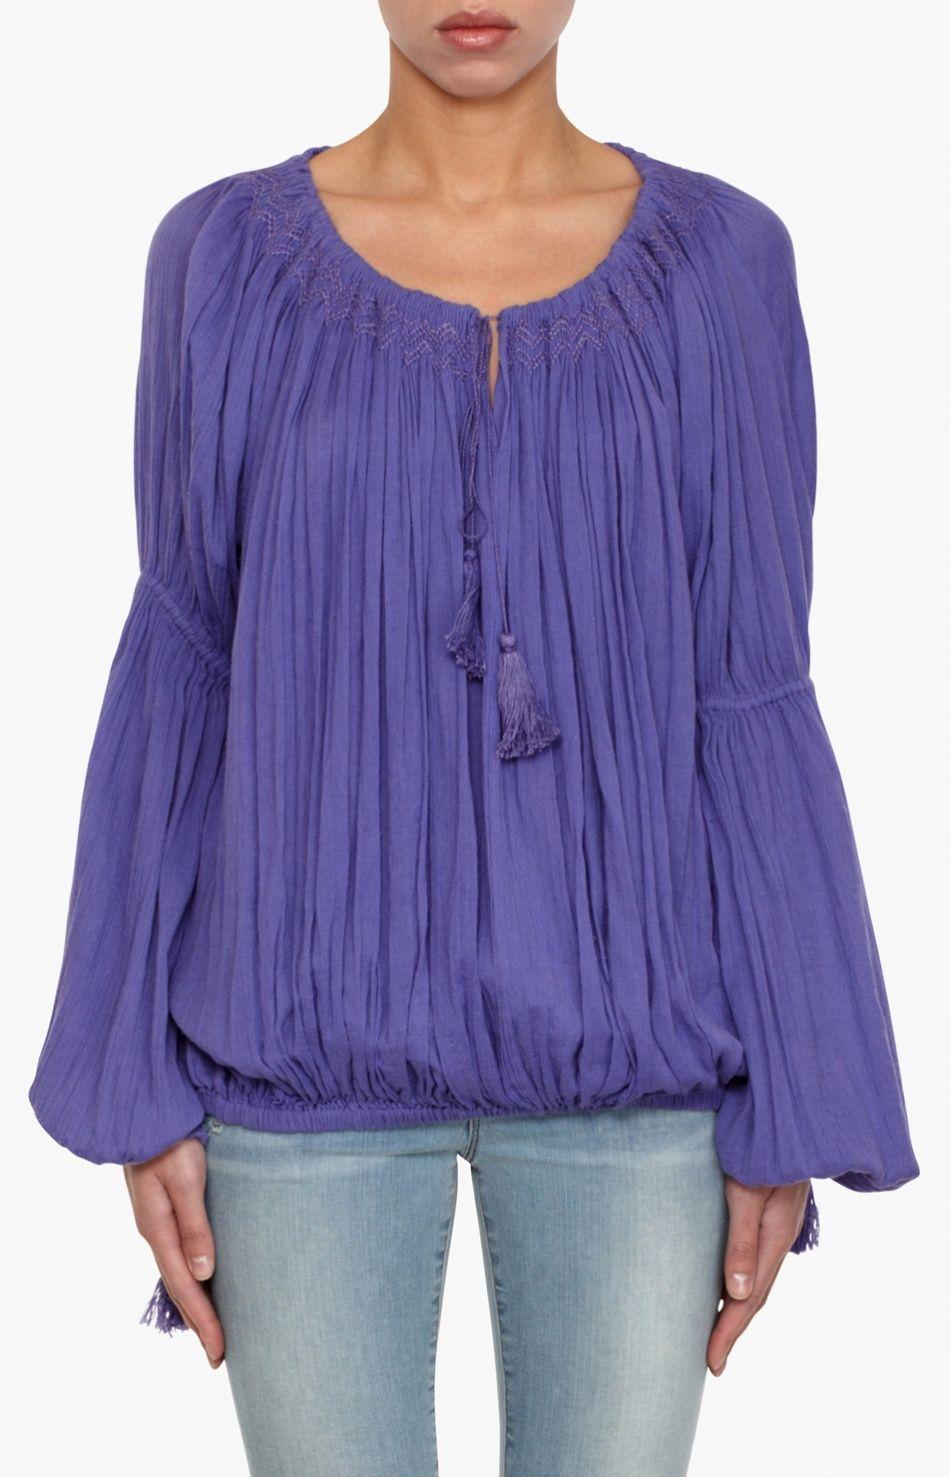 Purple Billy Blouse by Mes Desmoiselles